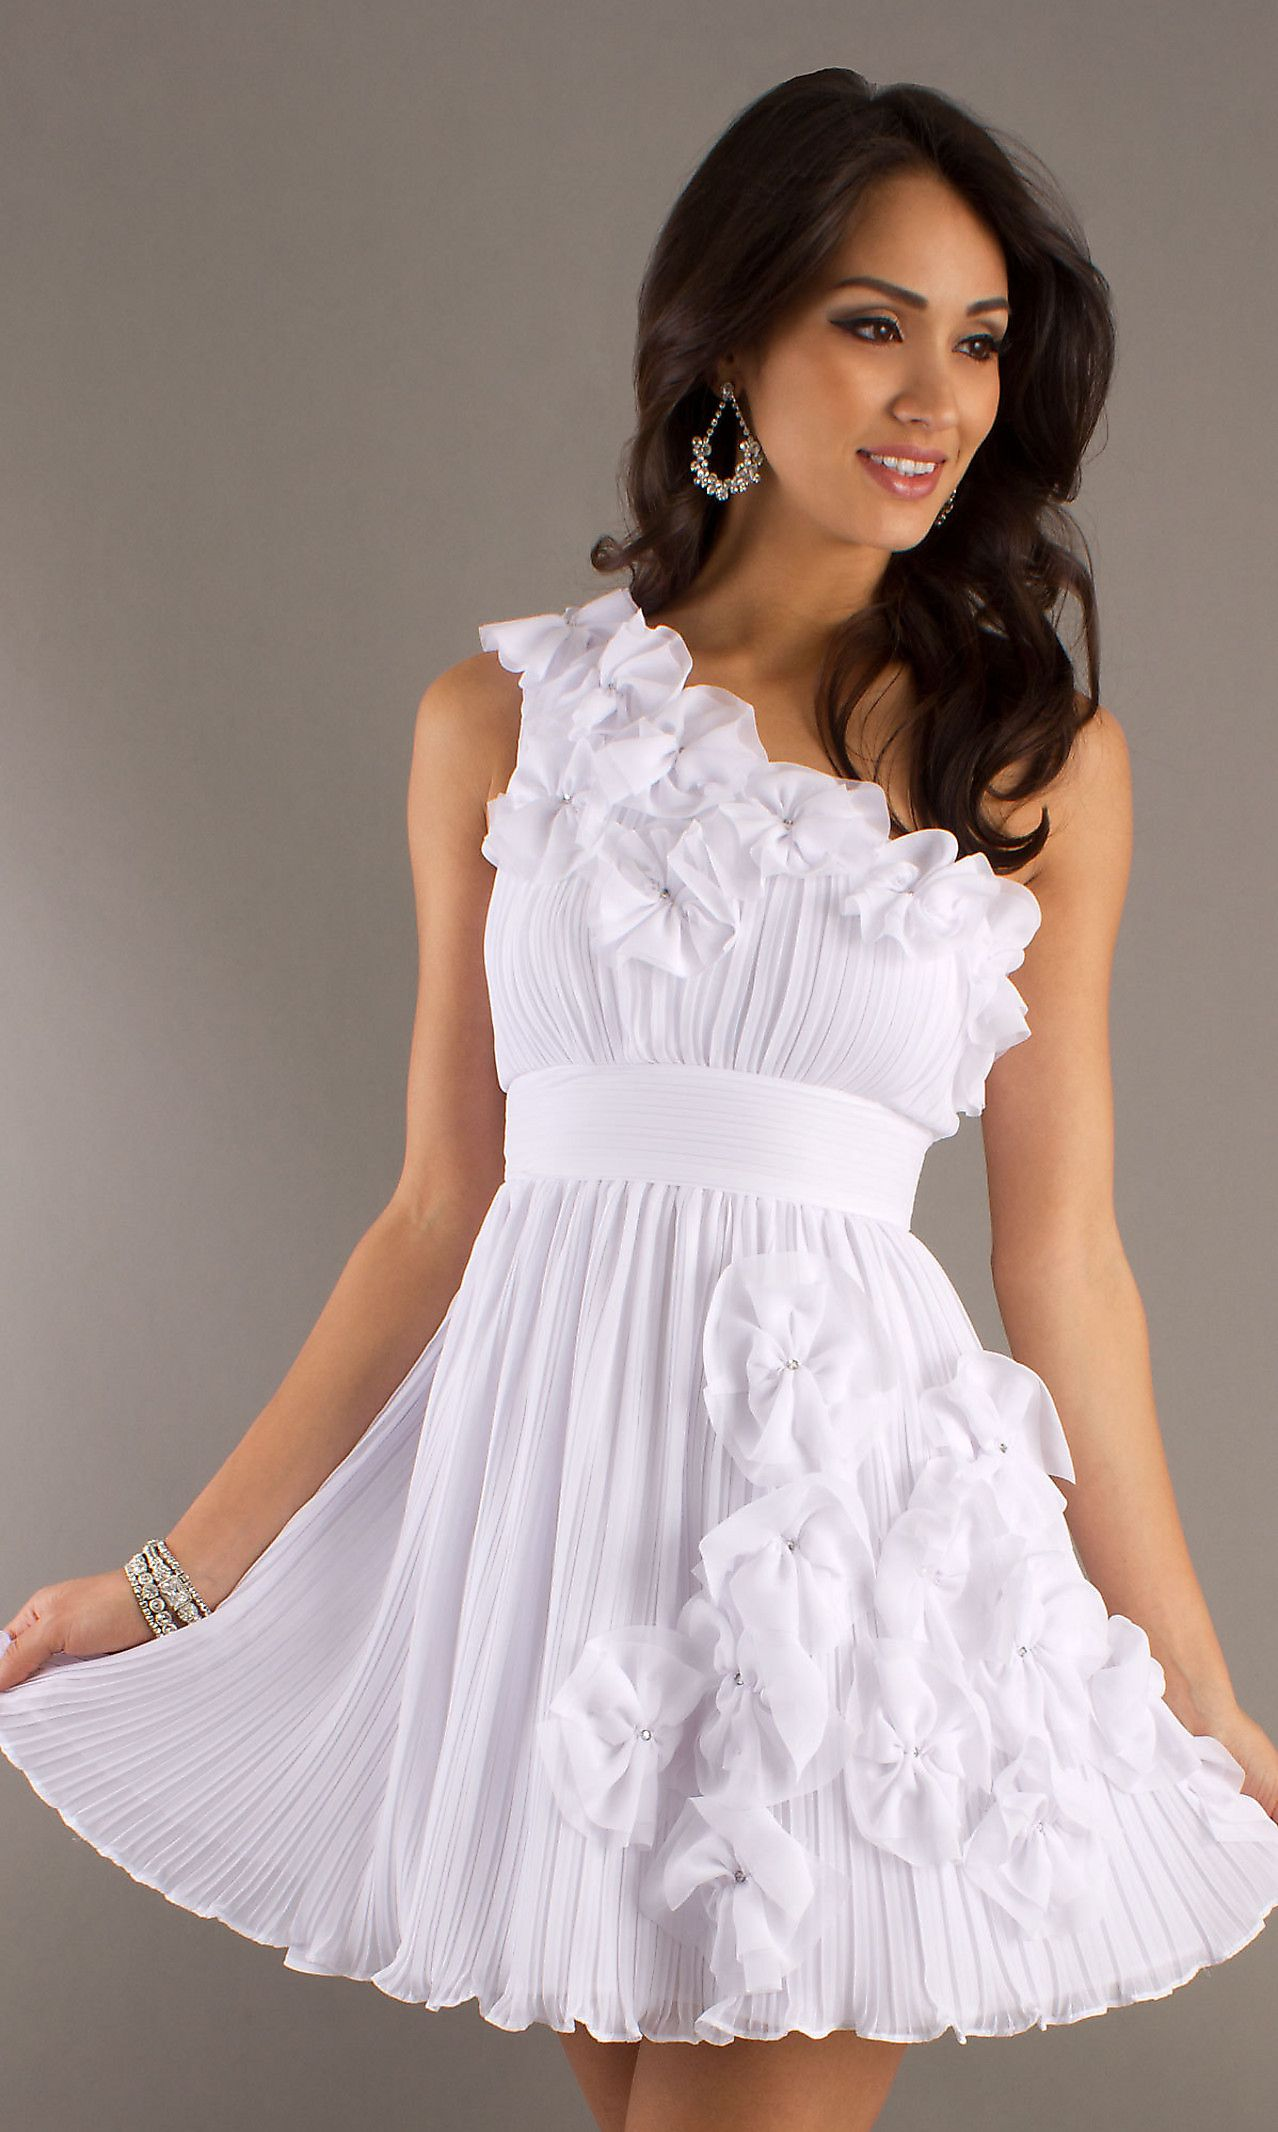 Short one shoulder dress xoahc wedding pinterest dresses